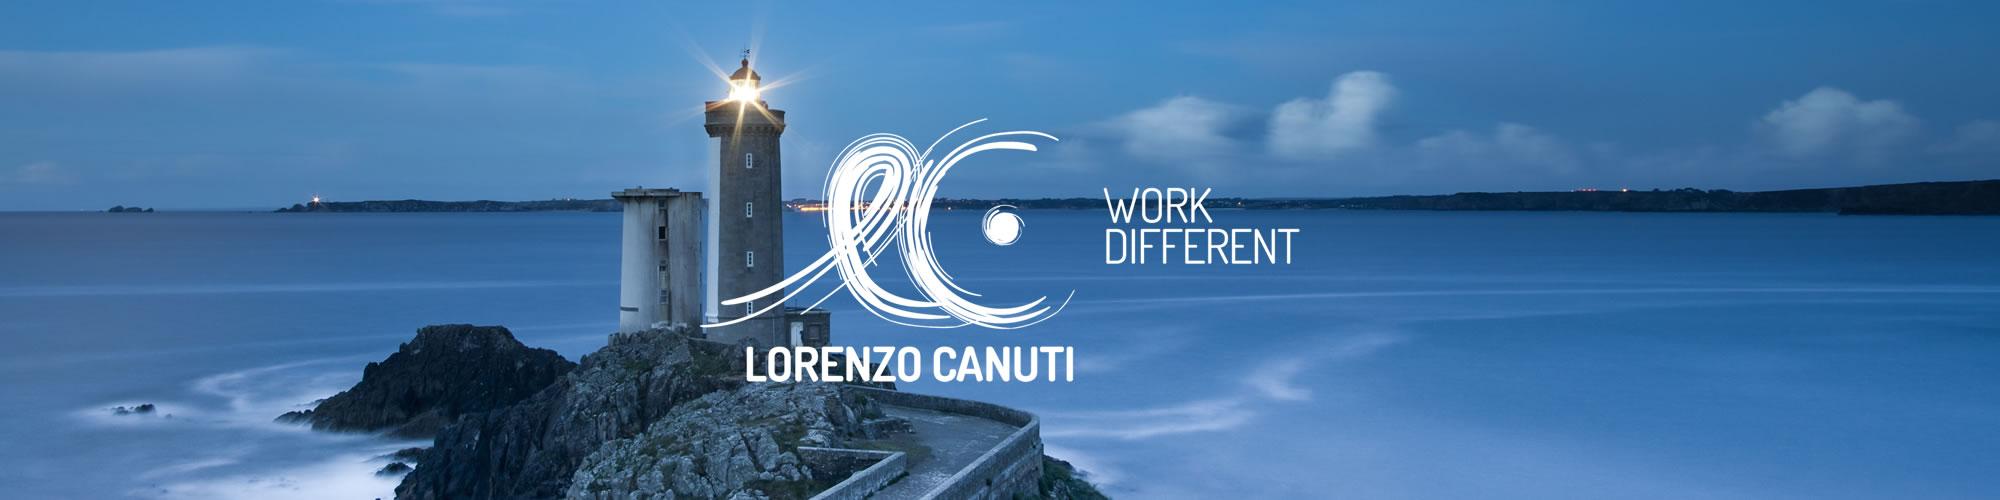 Lorenzo Canuti